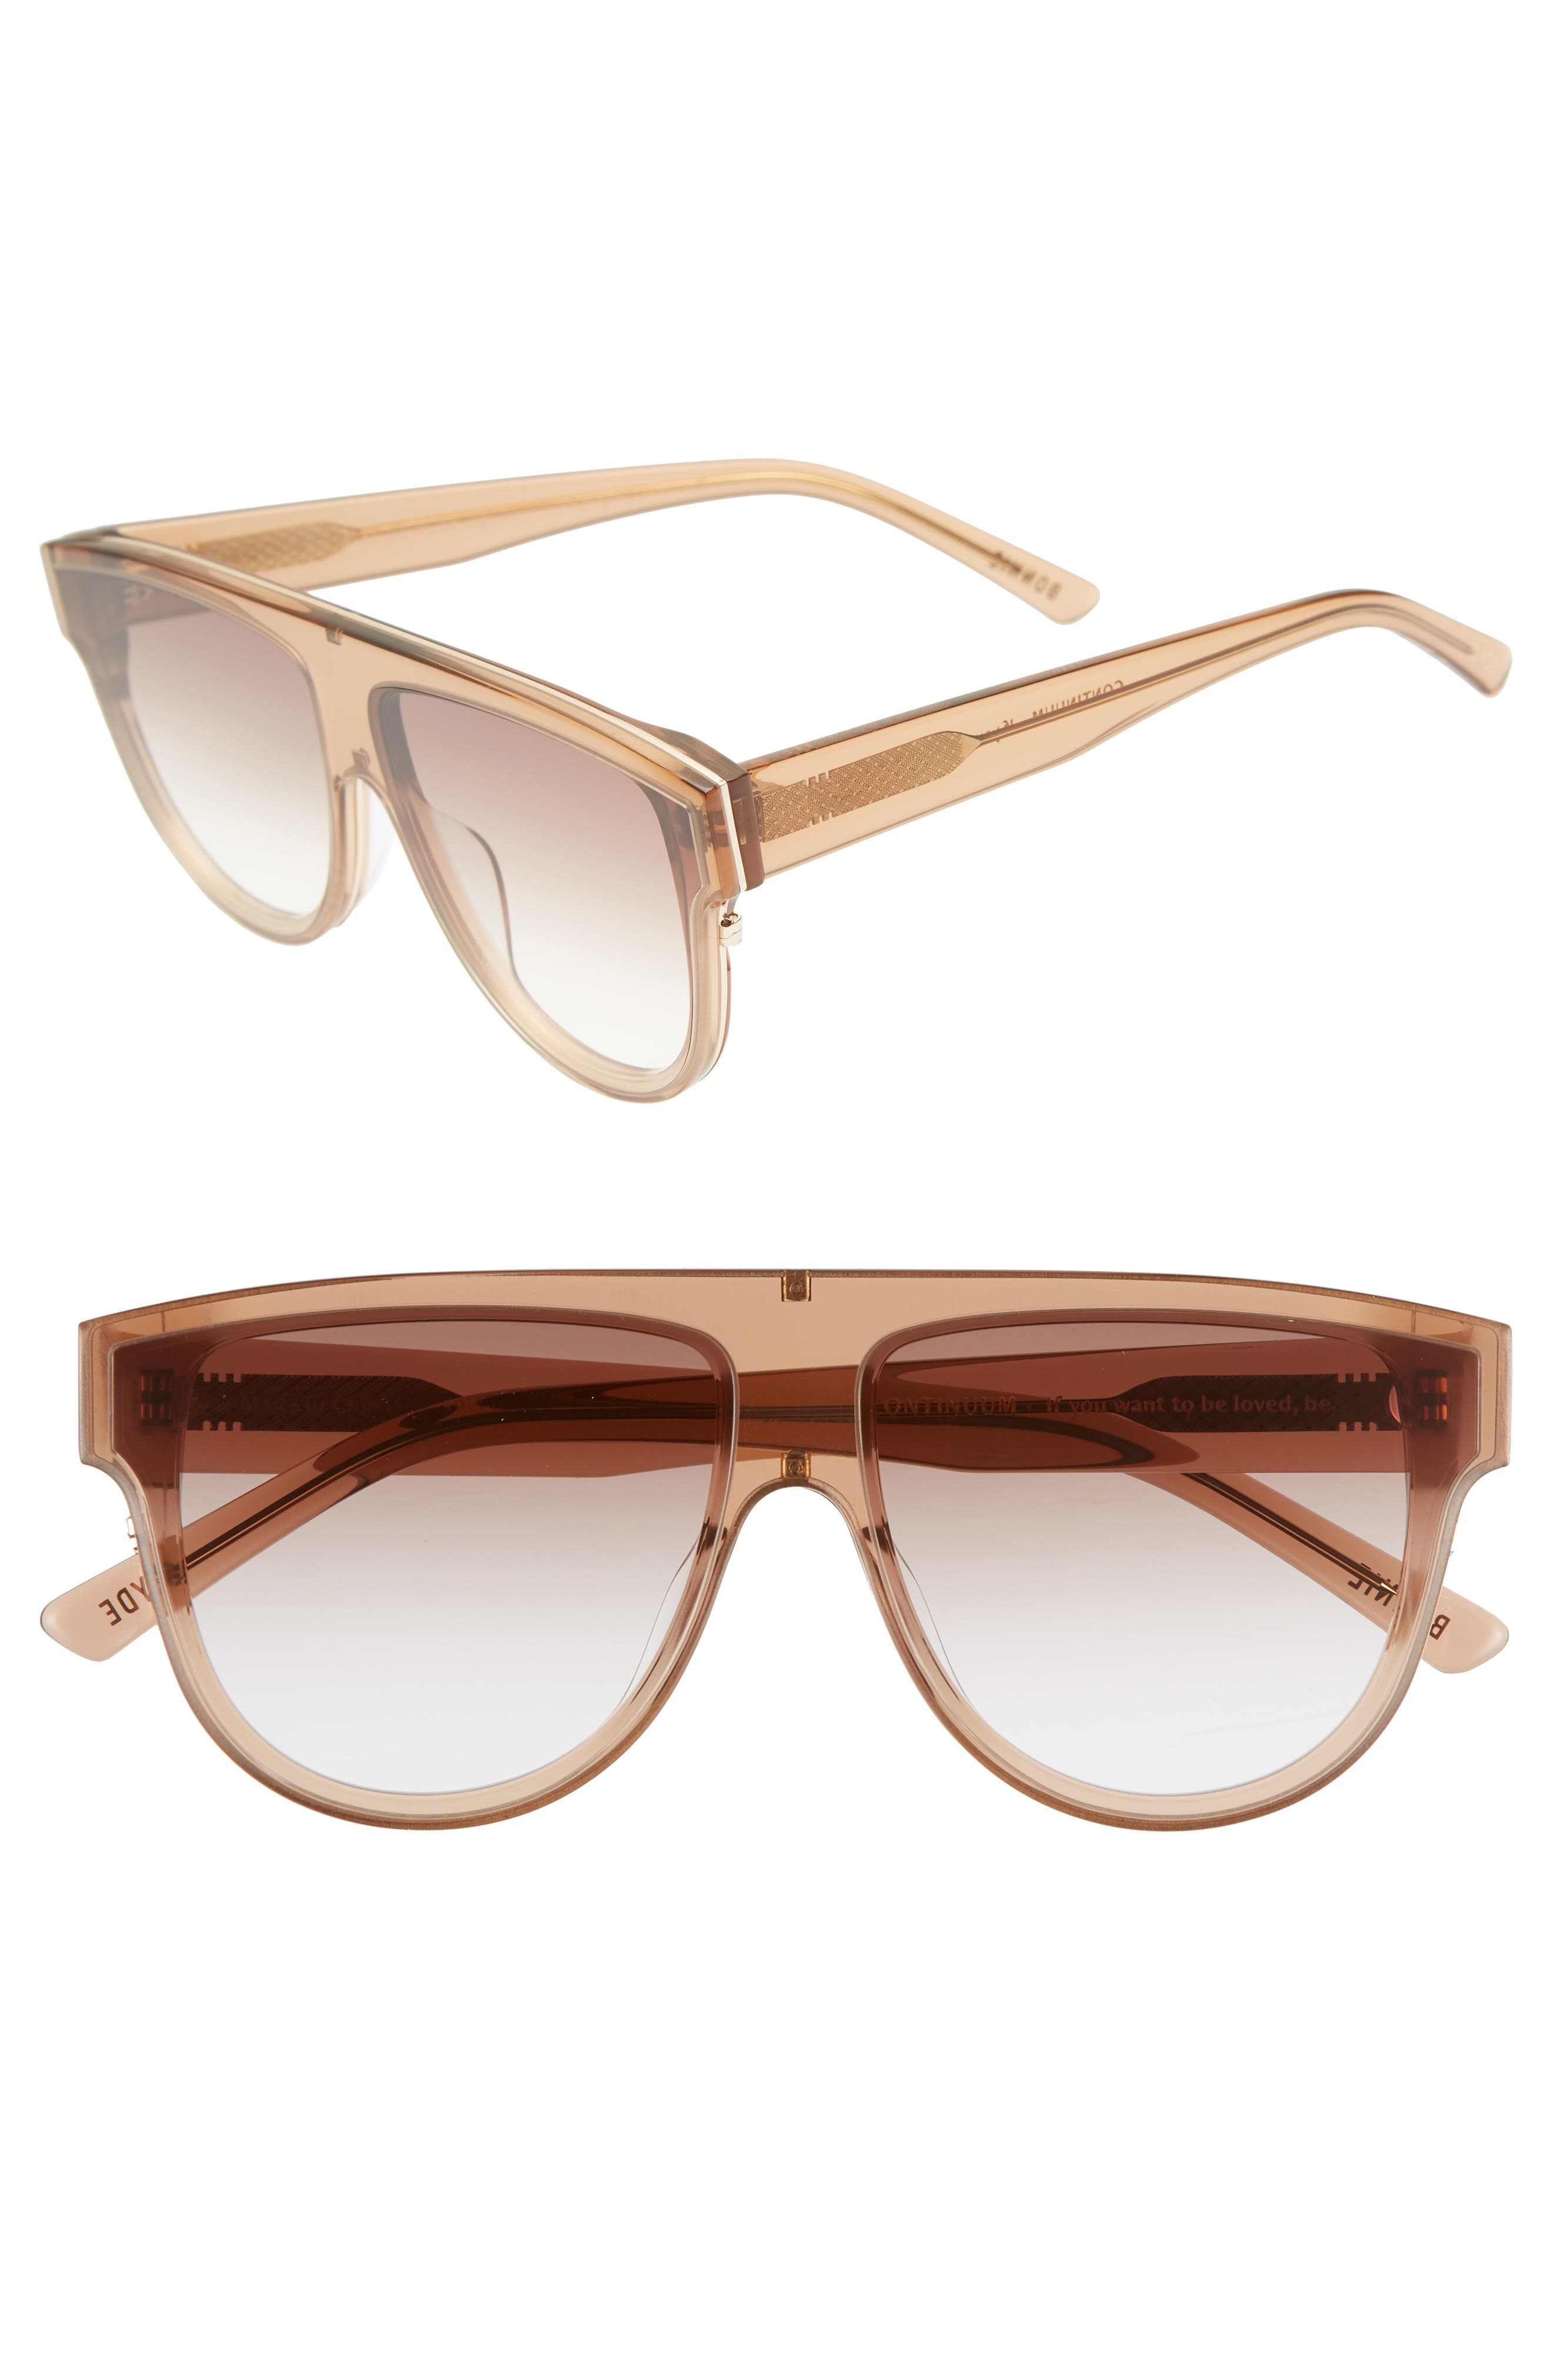 Continuum 63mm Oversize Flat Top Sunglasses,                         Main,                         color, AMBER GRADIENT